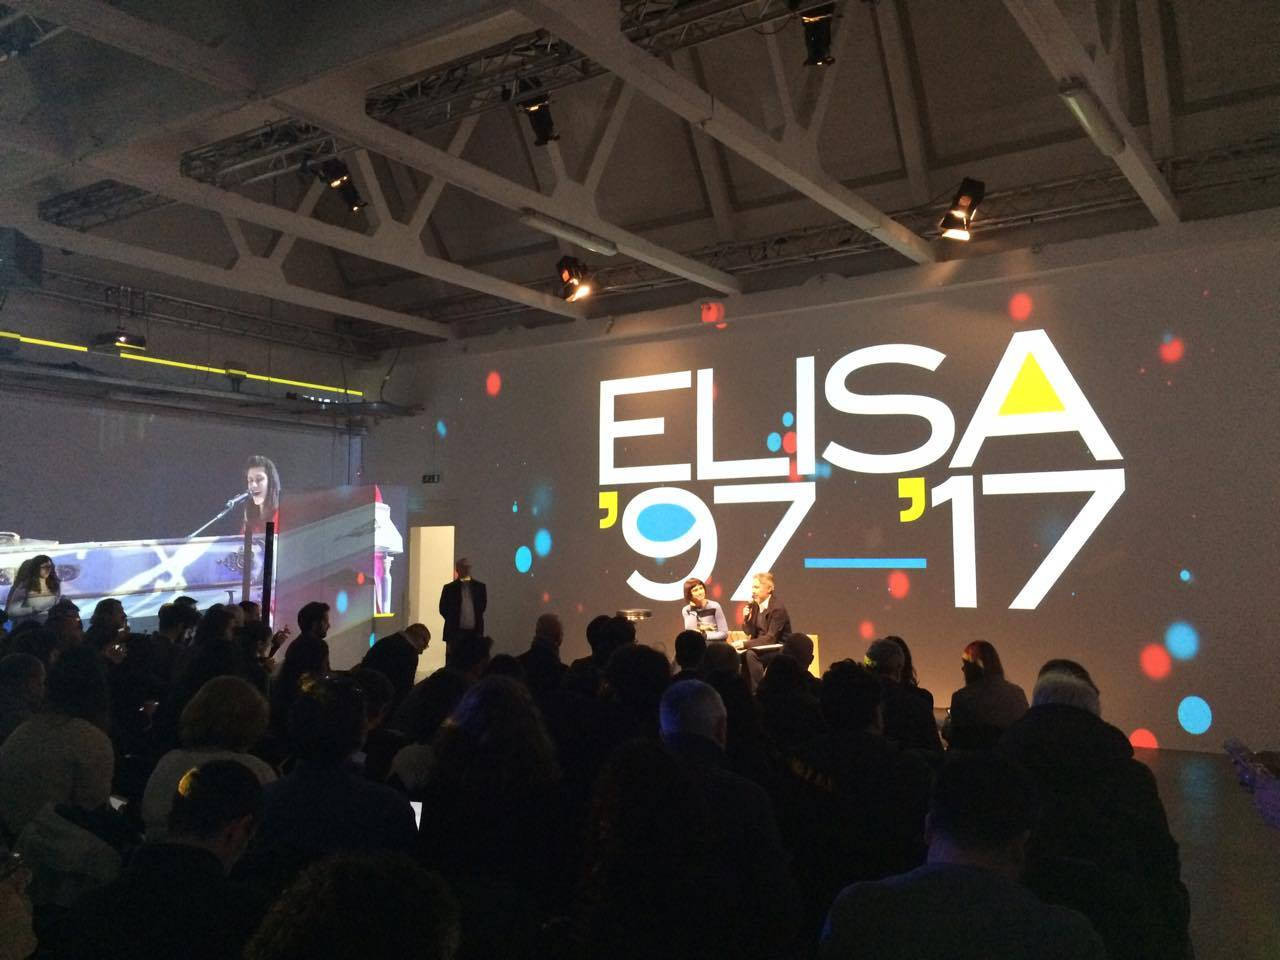 Elisa all'Arena di Verona | Date e Biglietti Concerti per Ventennale di carriera 1